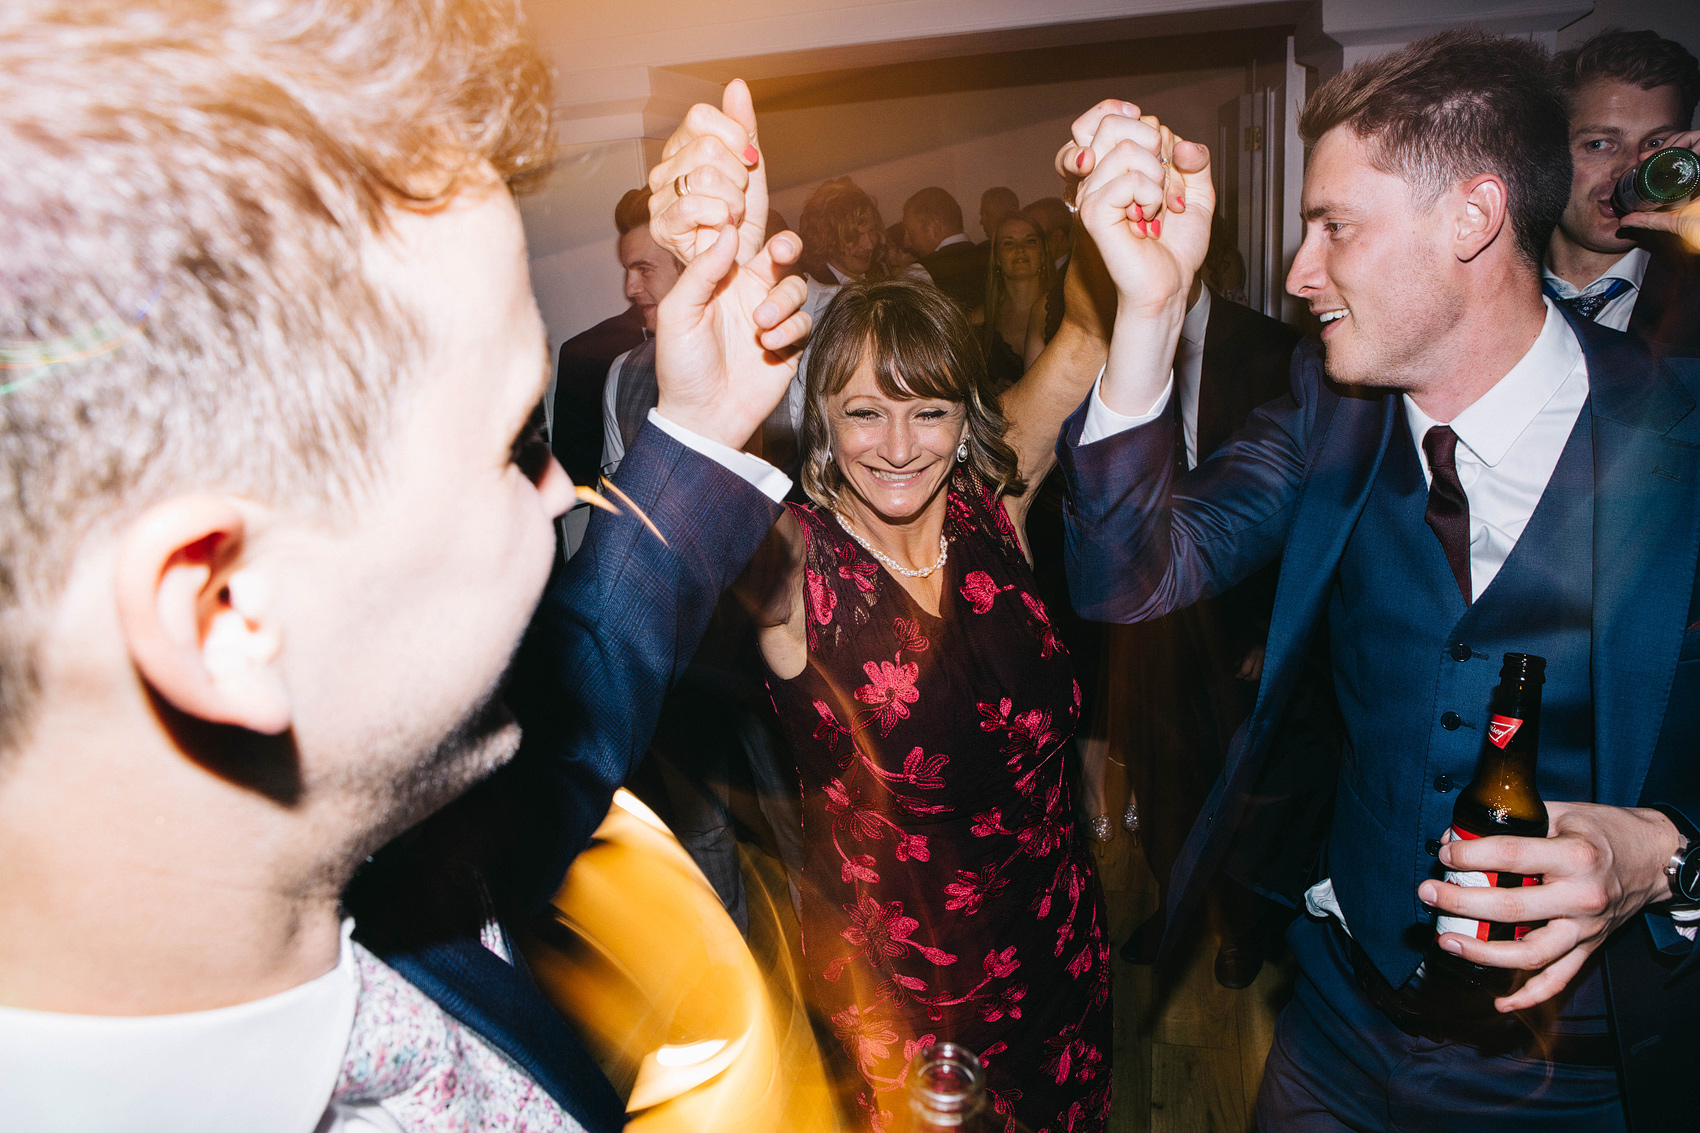 Claire_Basiuk_Richmond_Park,_London_Wedding_Photography_-34.jpg